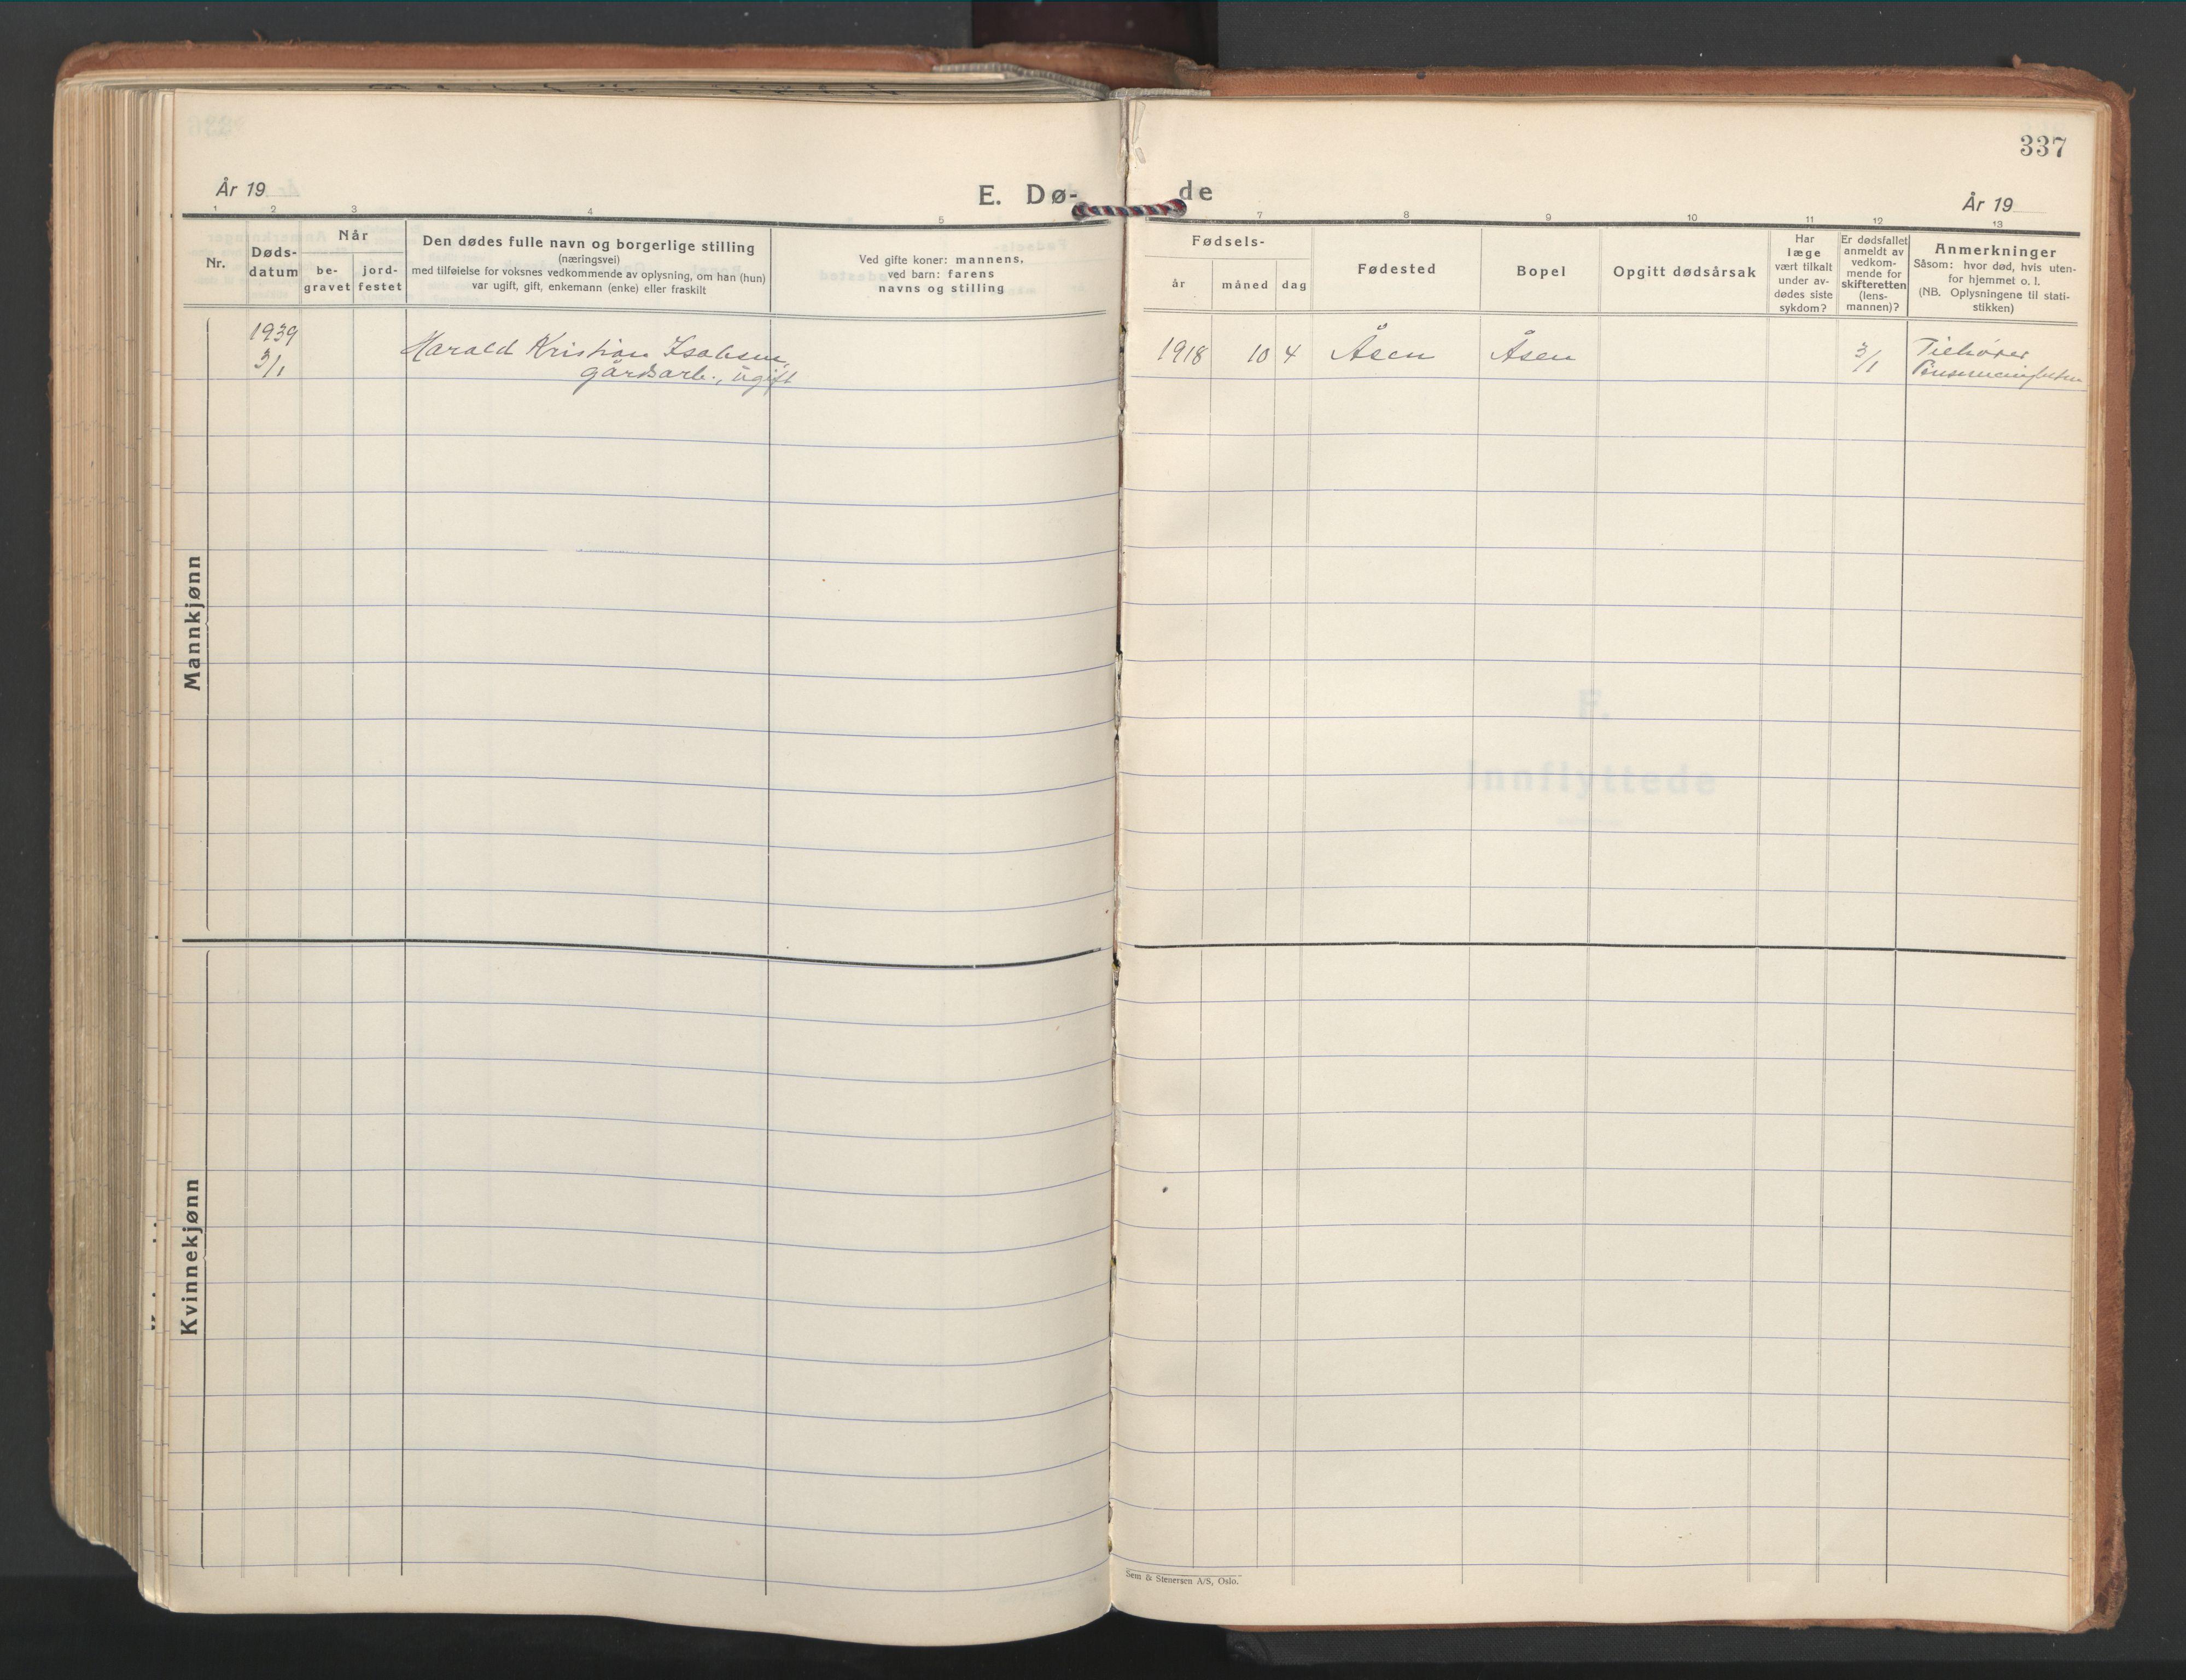 SAT, Ministerialprotokoller, klokkerbøker og fødselsregistre - Nordland, 802/L0061: Ministerialbok nr. 802A08, 1933-1946, s. 337